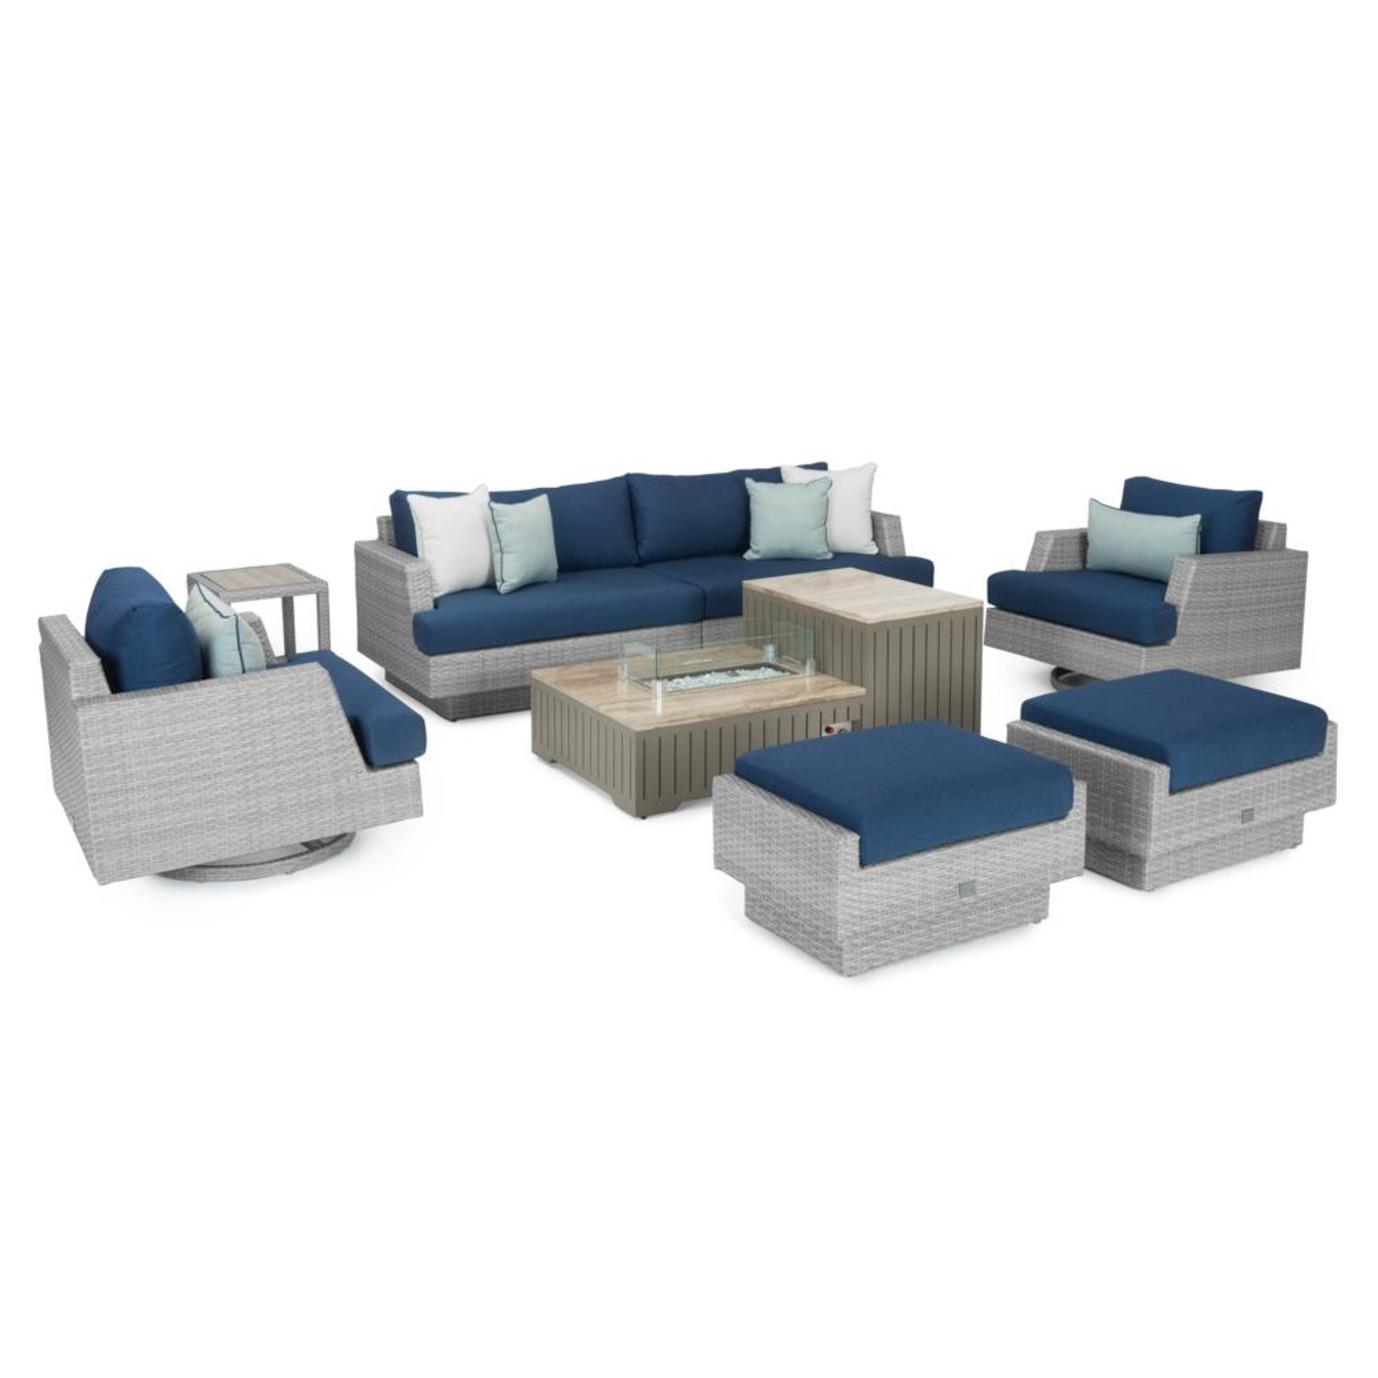 Portofino® Comfort 8 Piece Motion Fire Seating